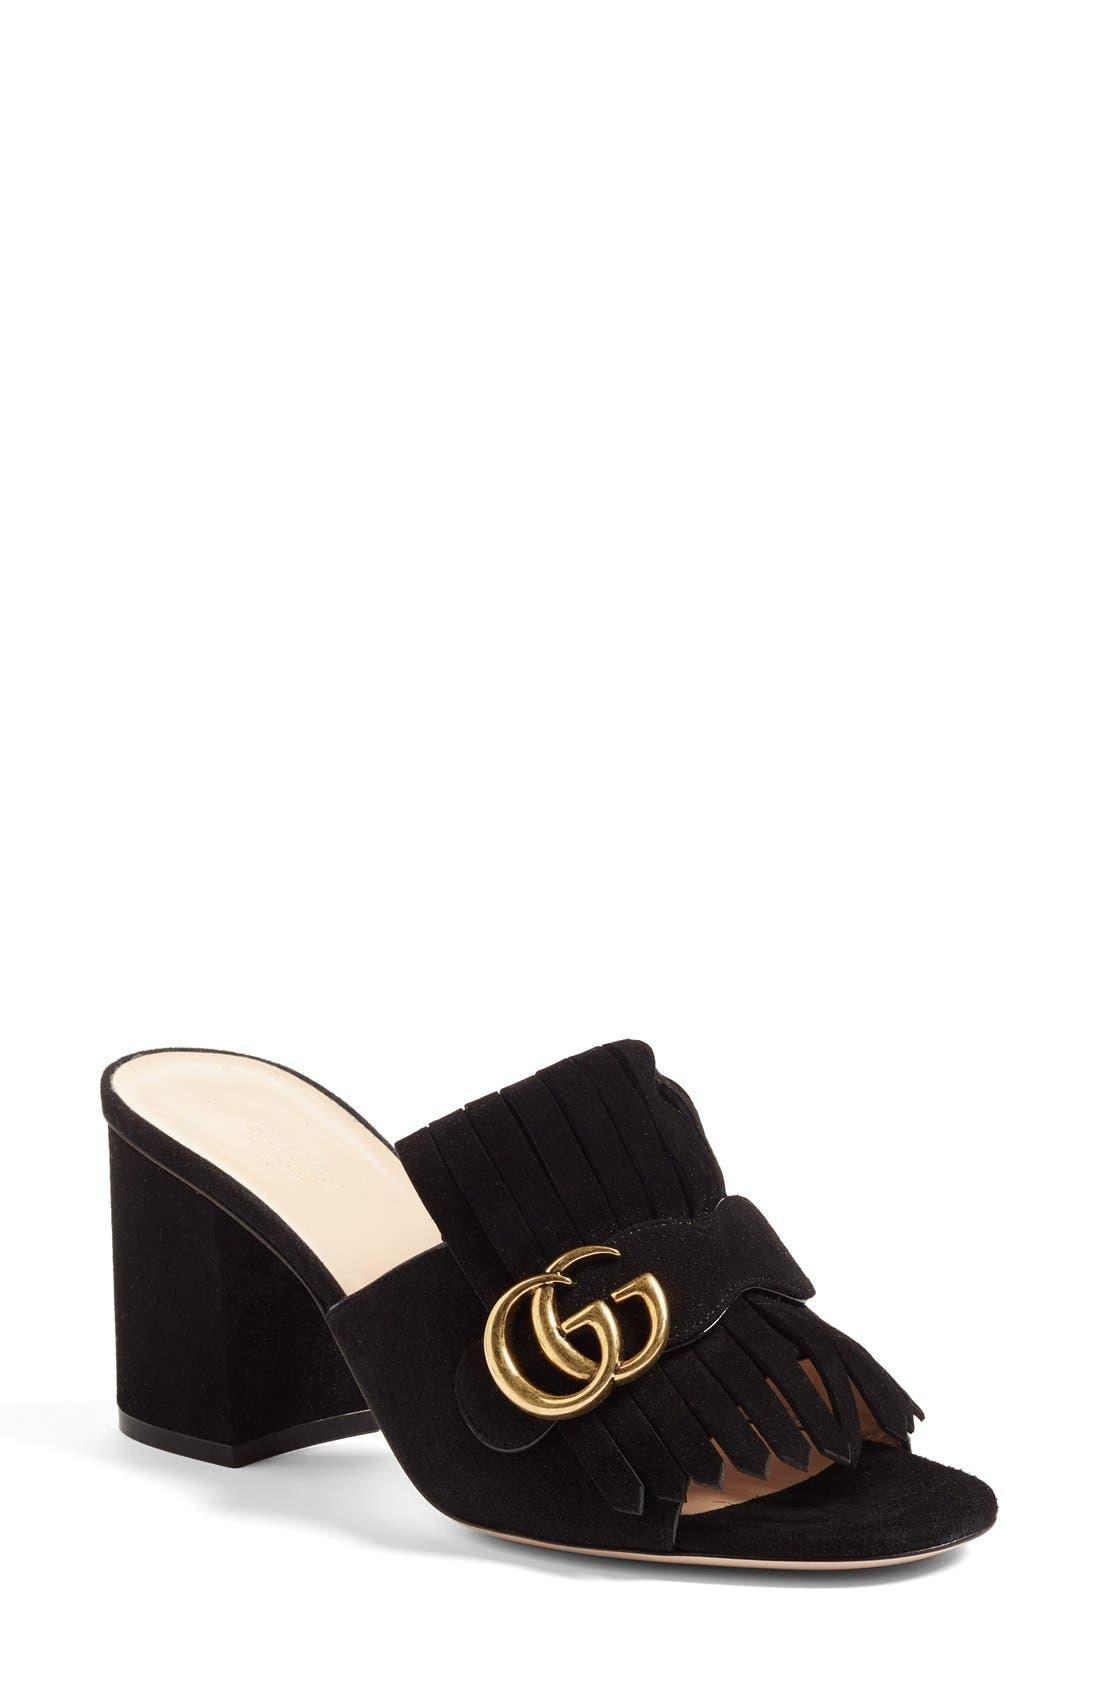 GG Marmont Peep Toe Mule,                         Main,                         color, Black Suede